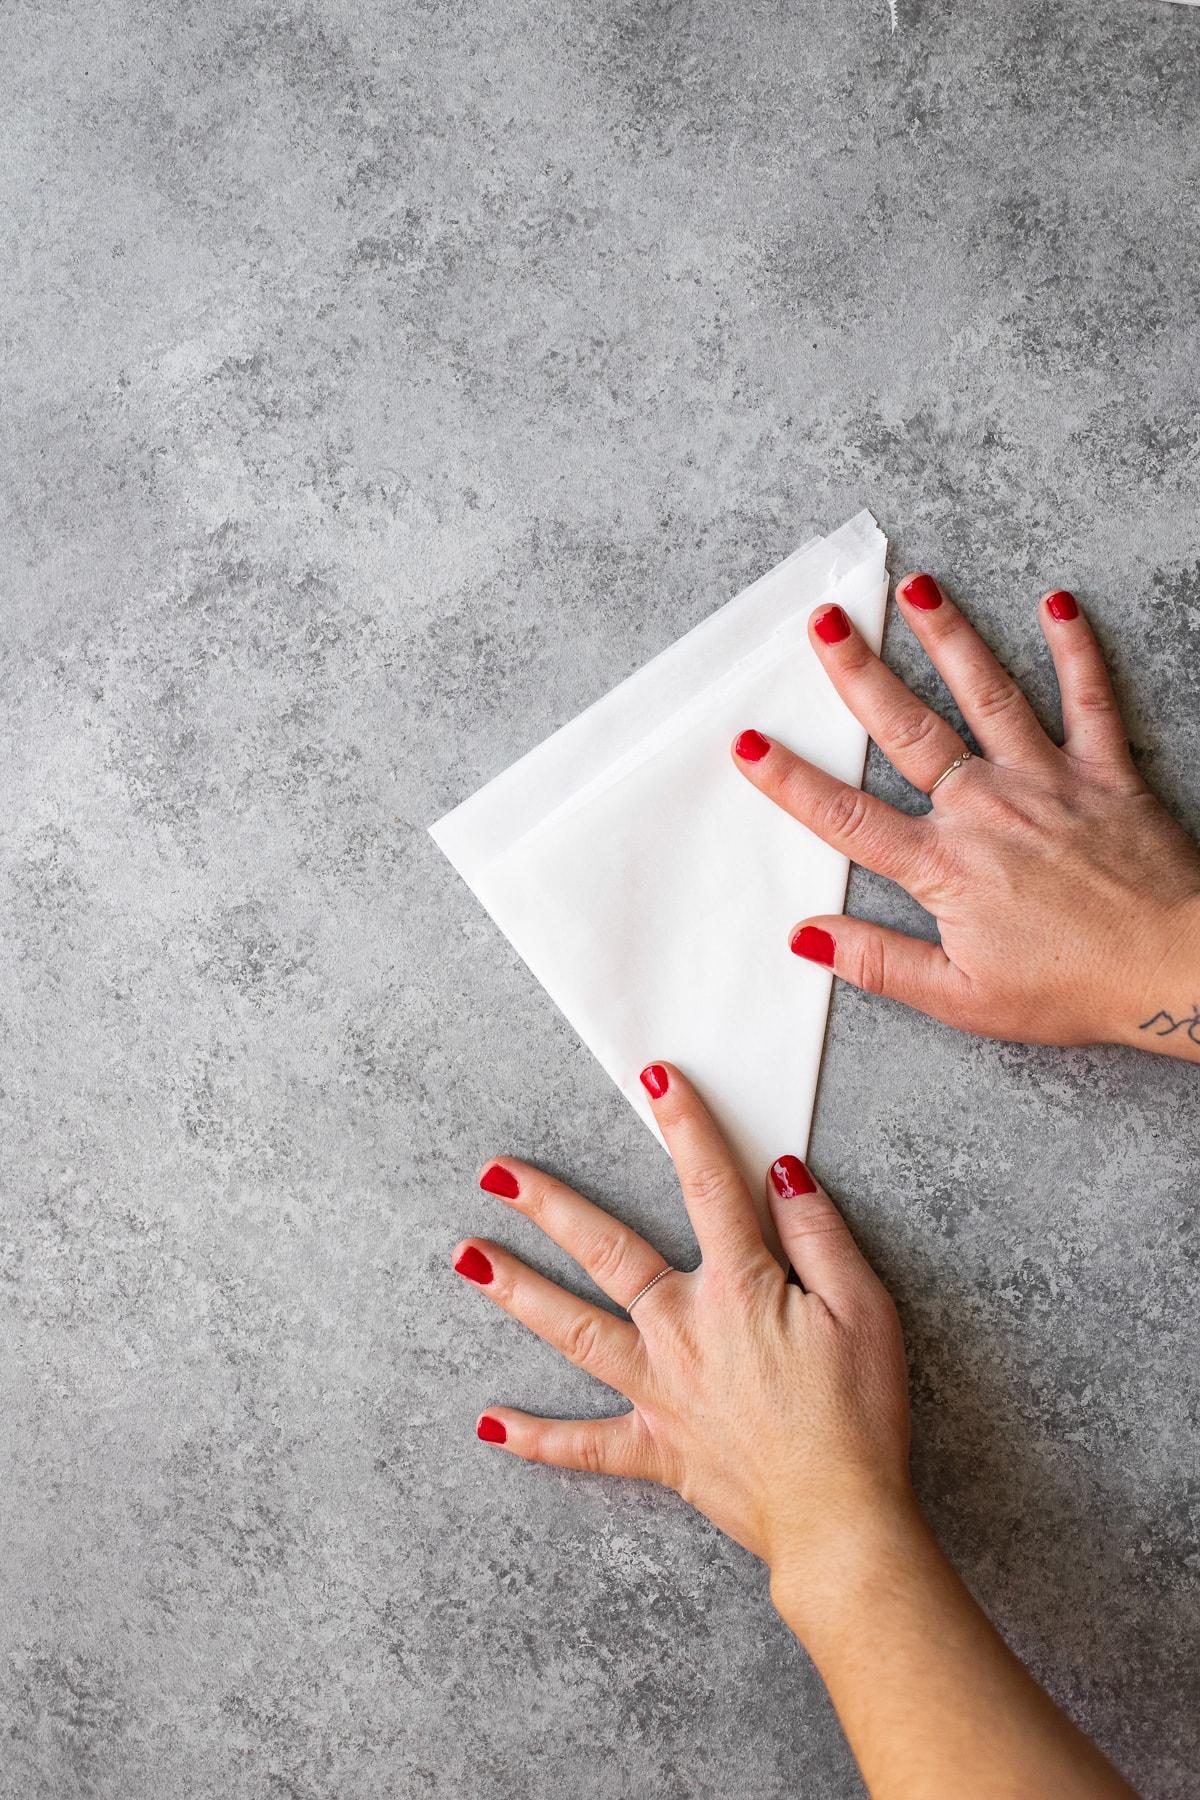 A piece of parchment folded into a triangular shape.